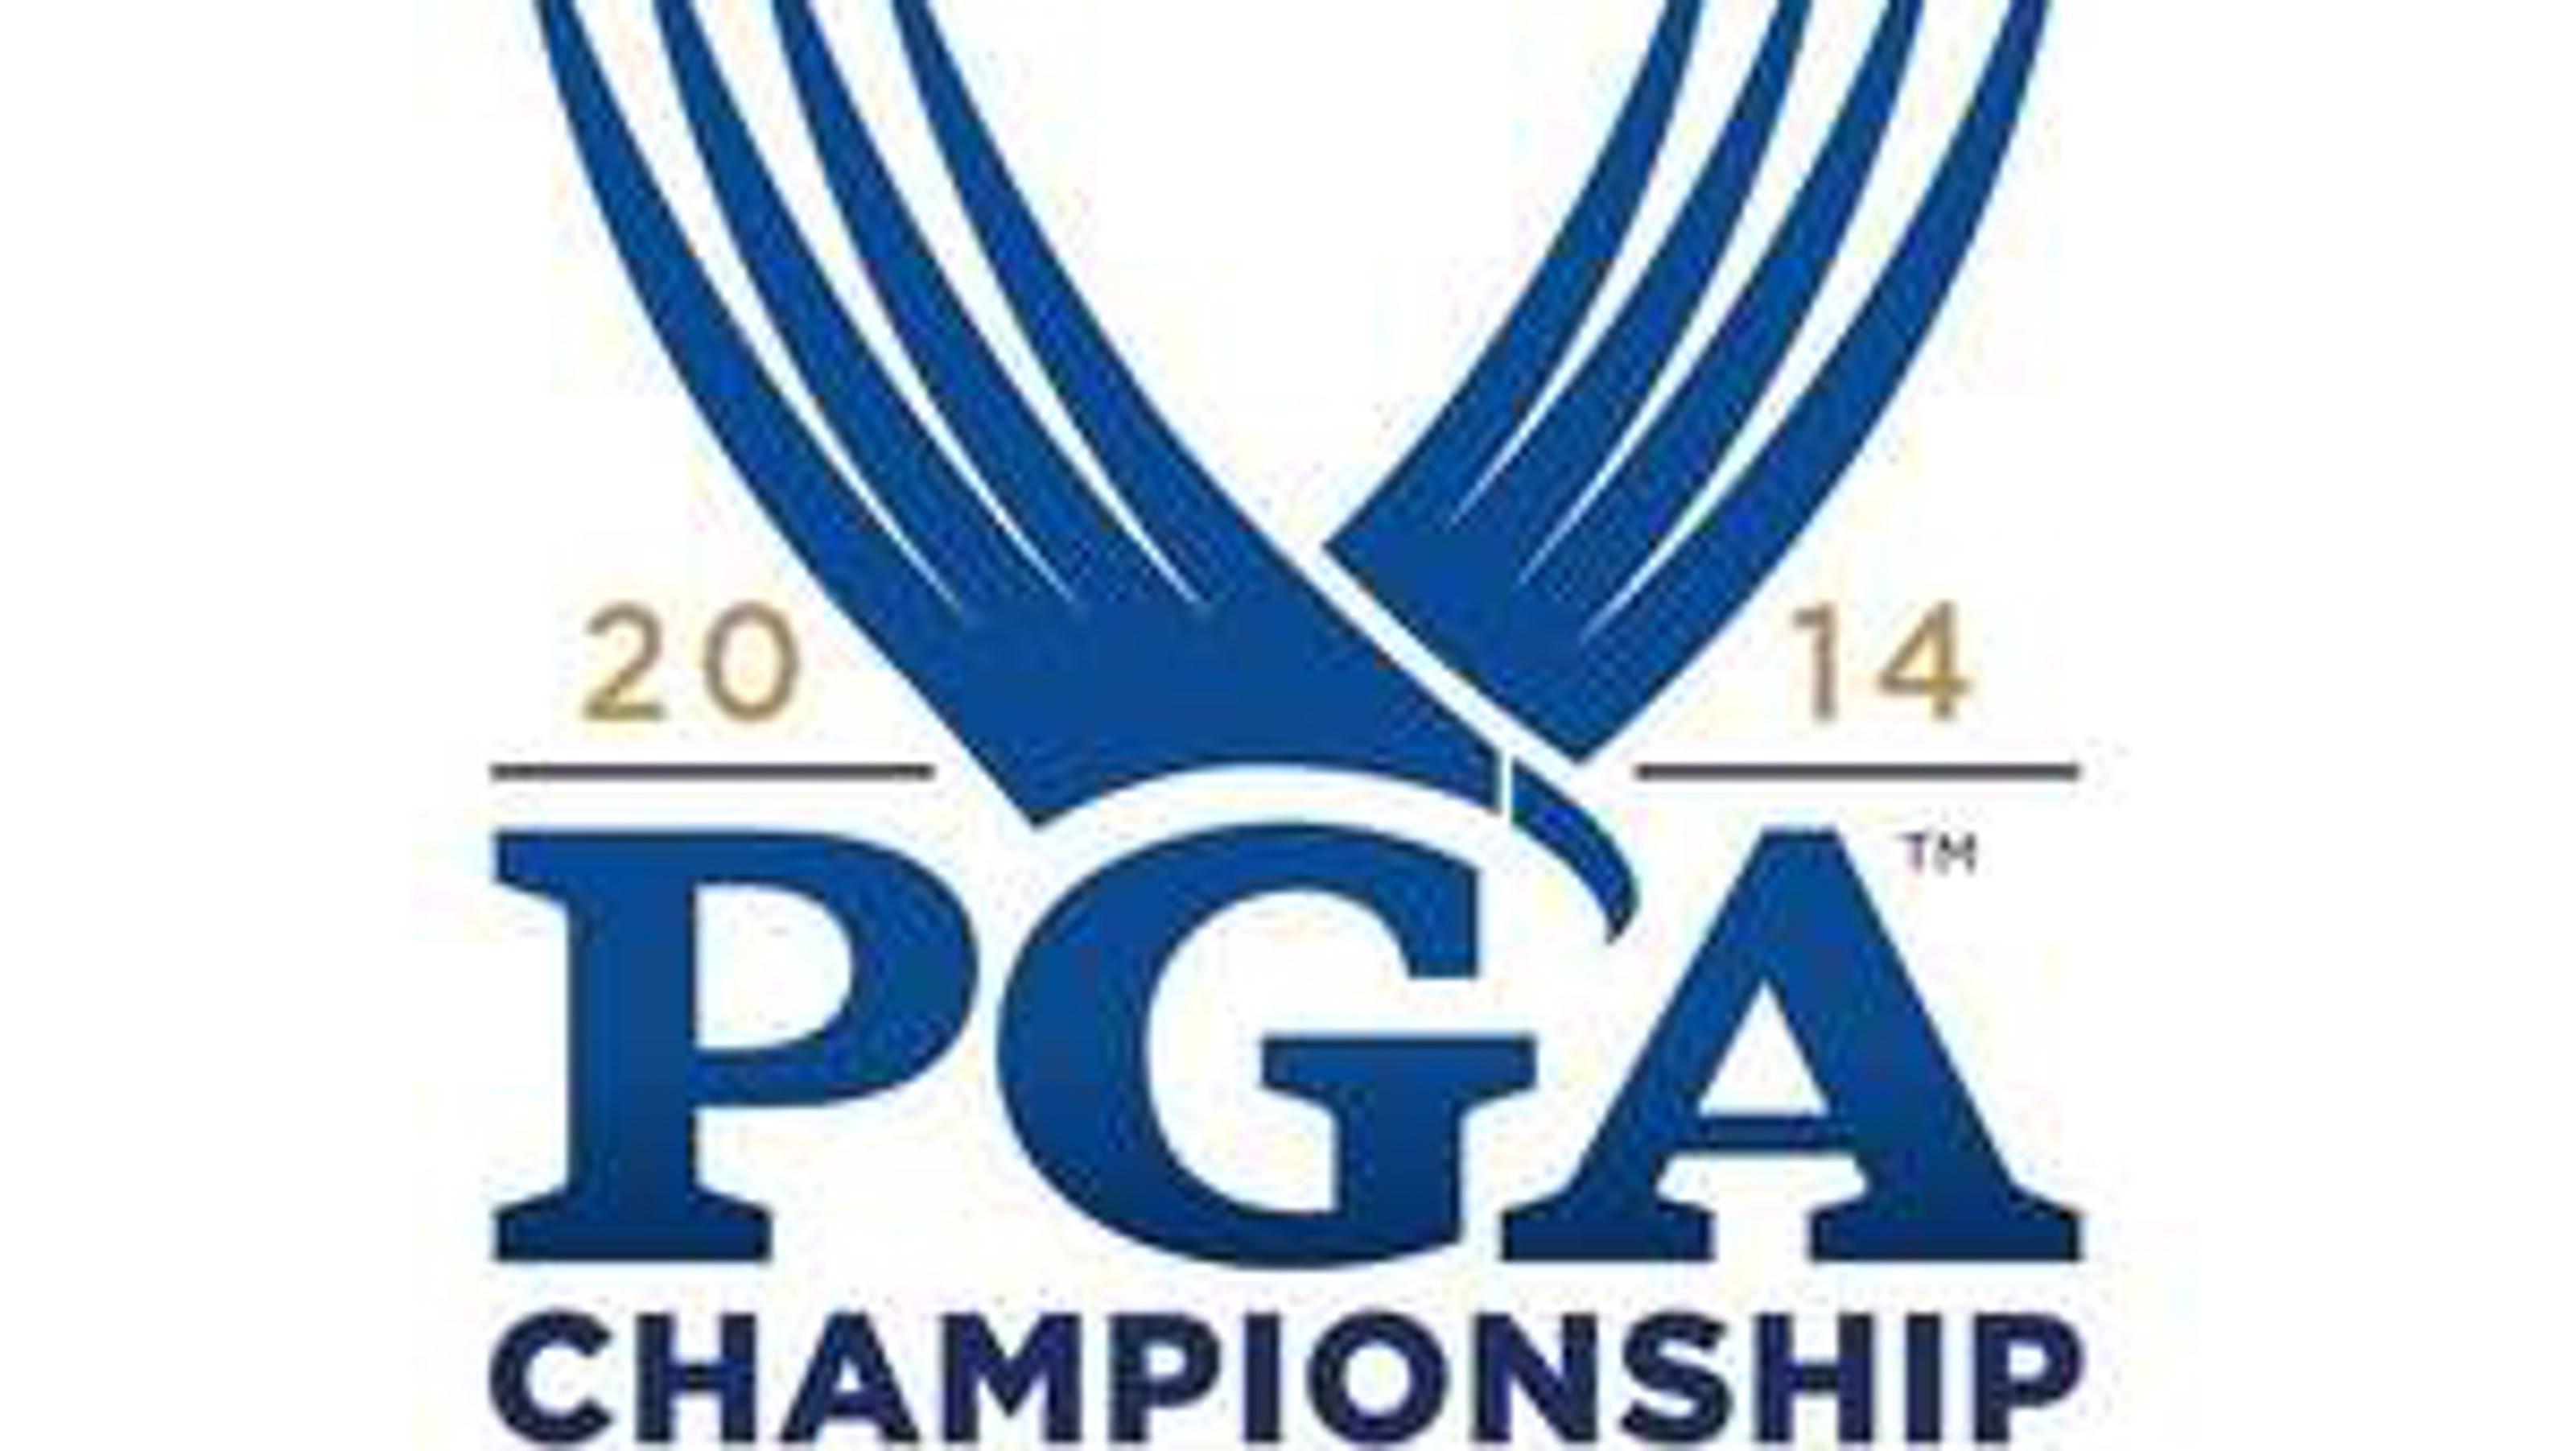 Ticket sales resume for 2014 PGA Championship at Valhalla